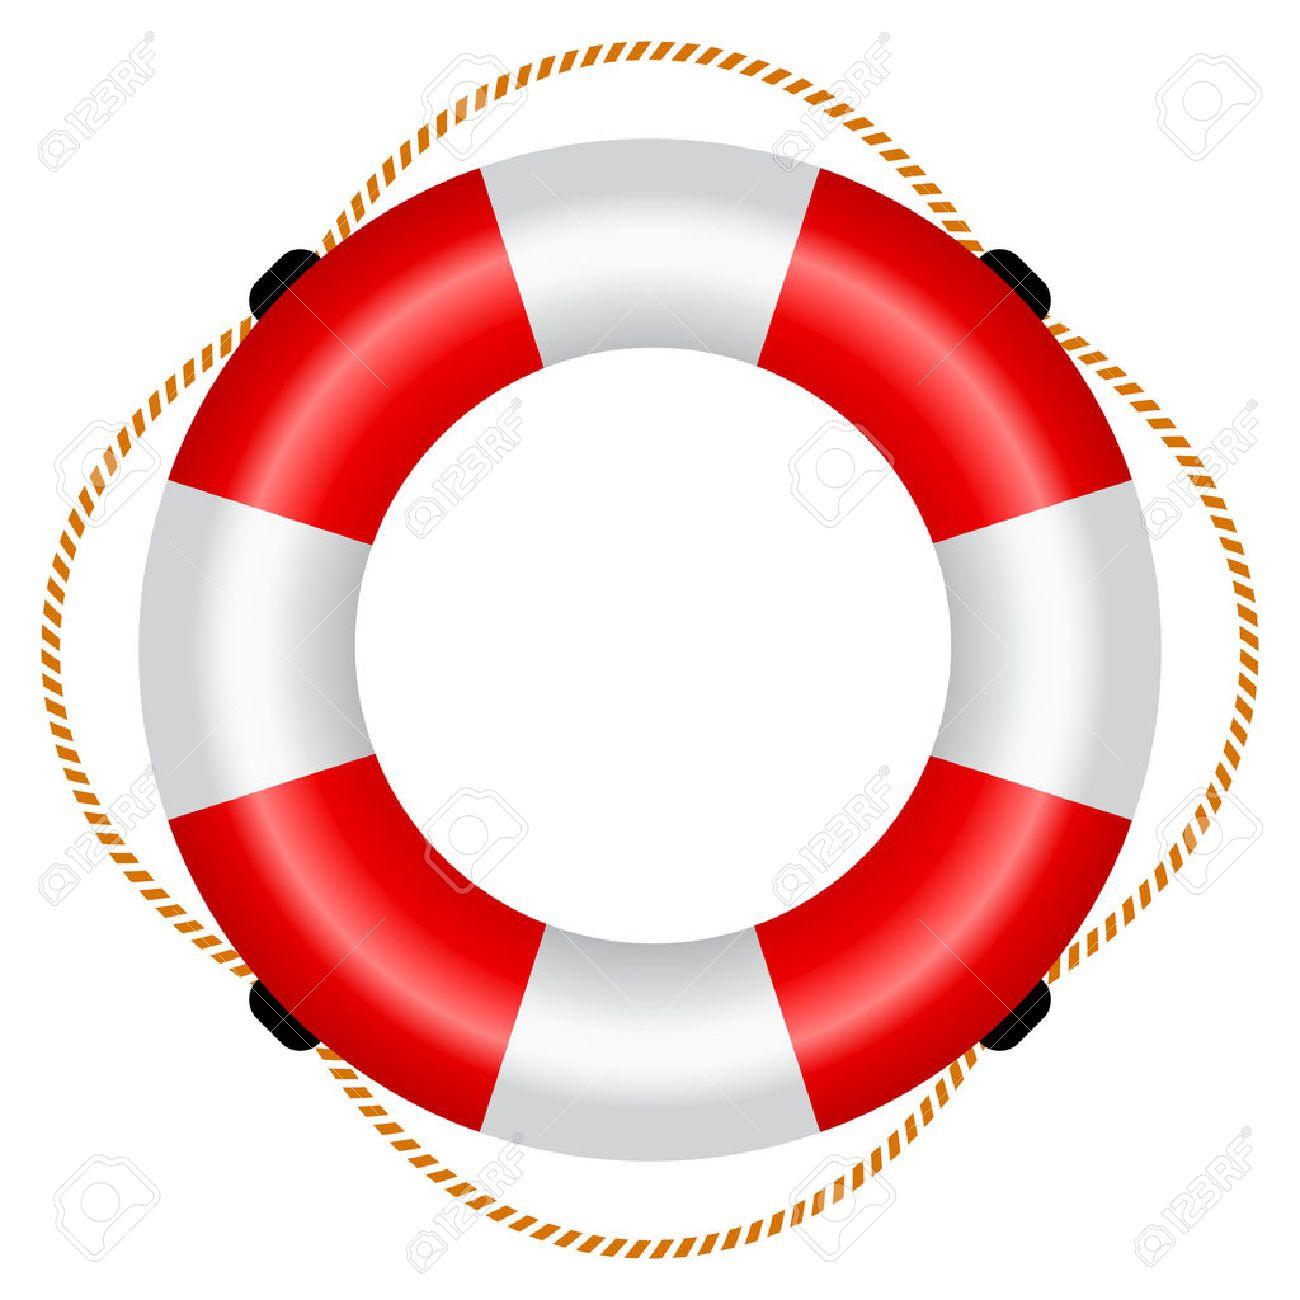 Life raft icon.